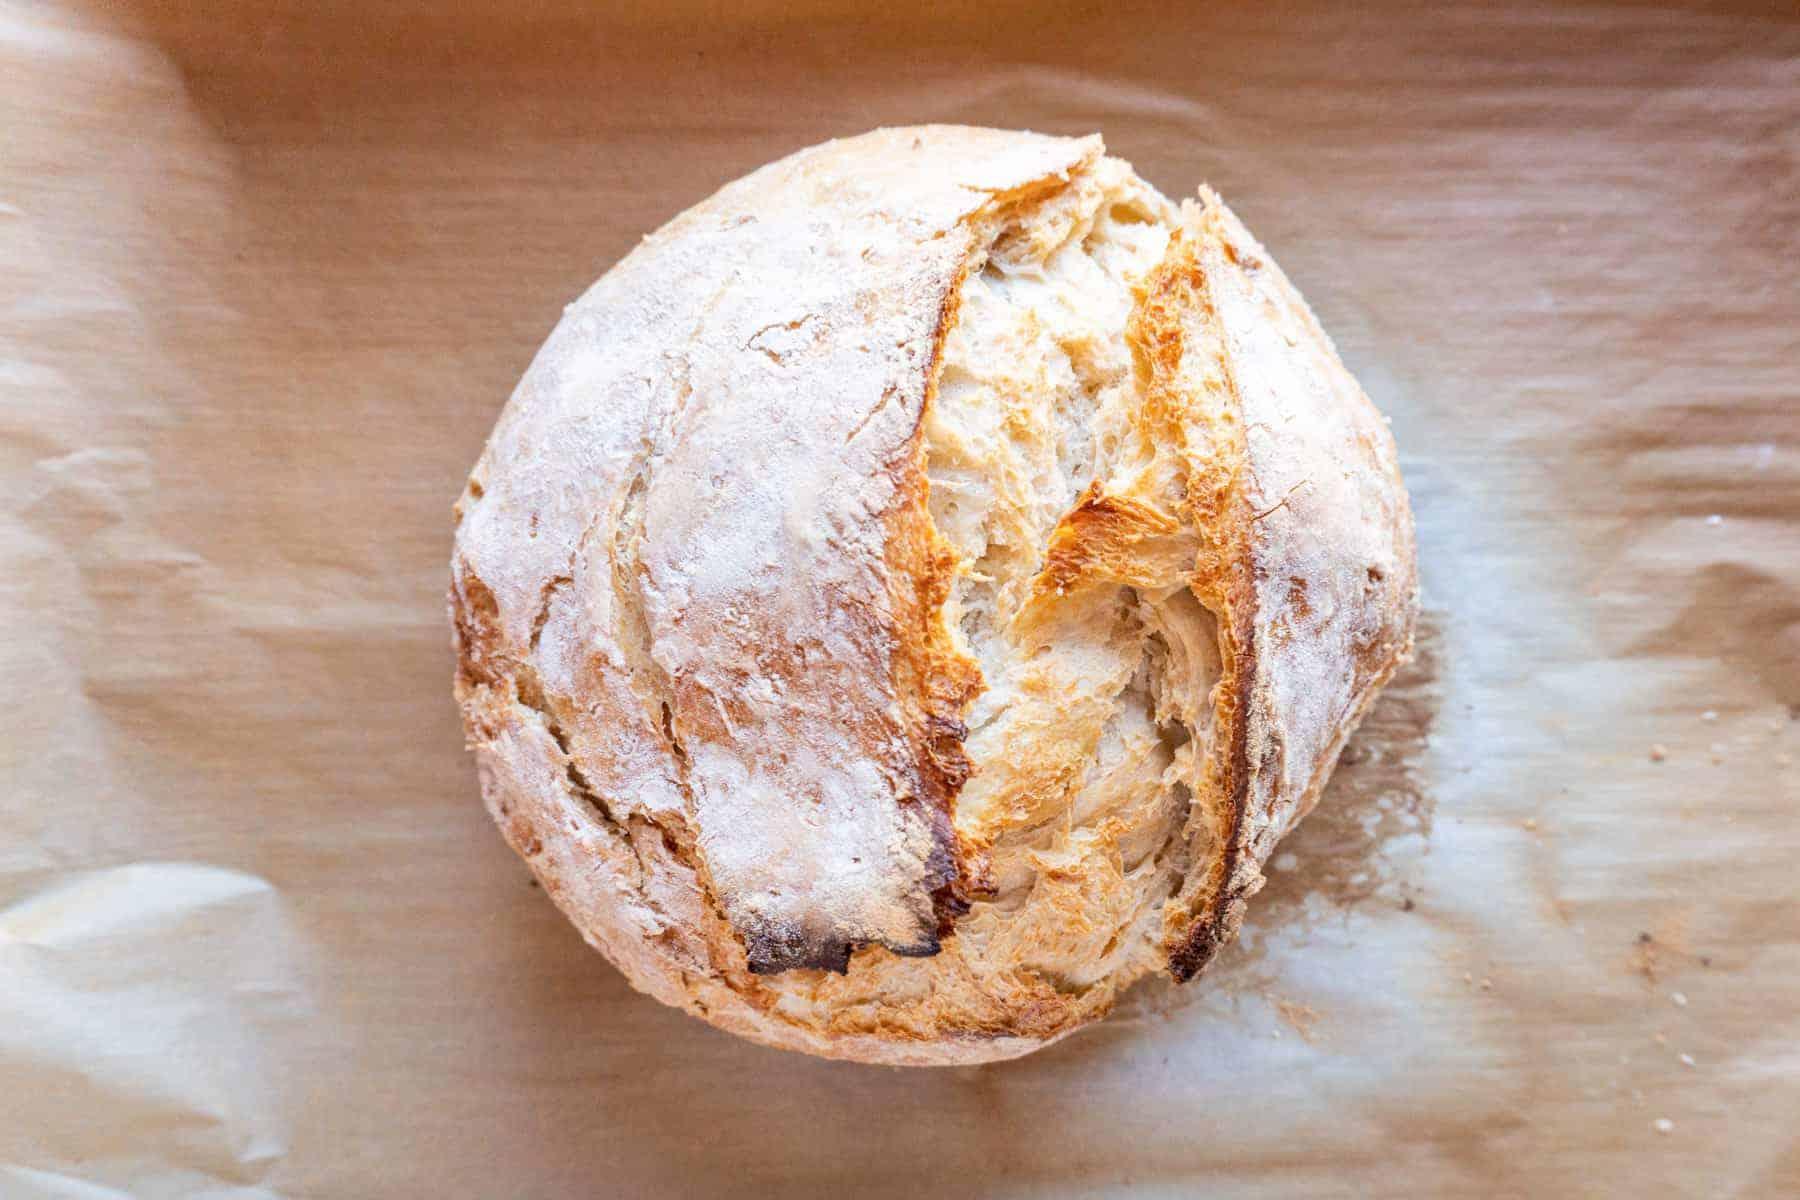 bread baked on baking sheet